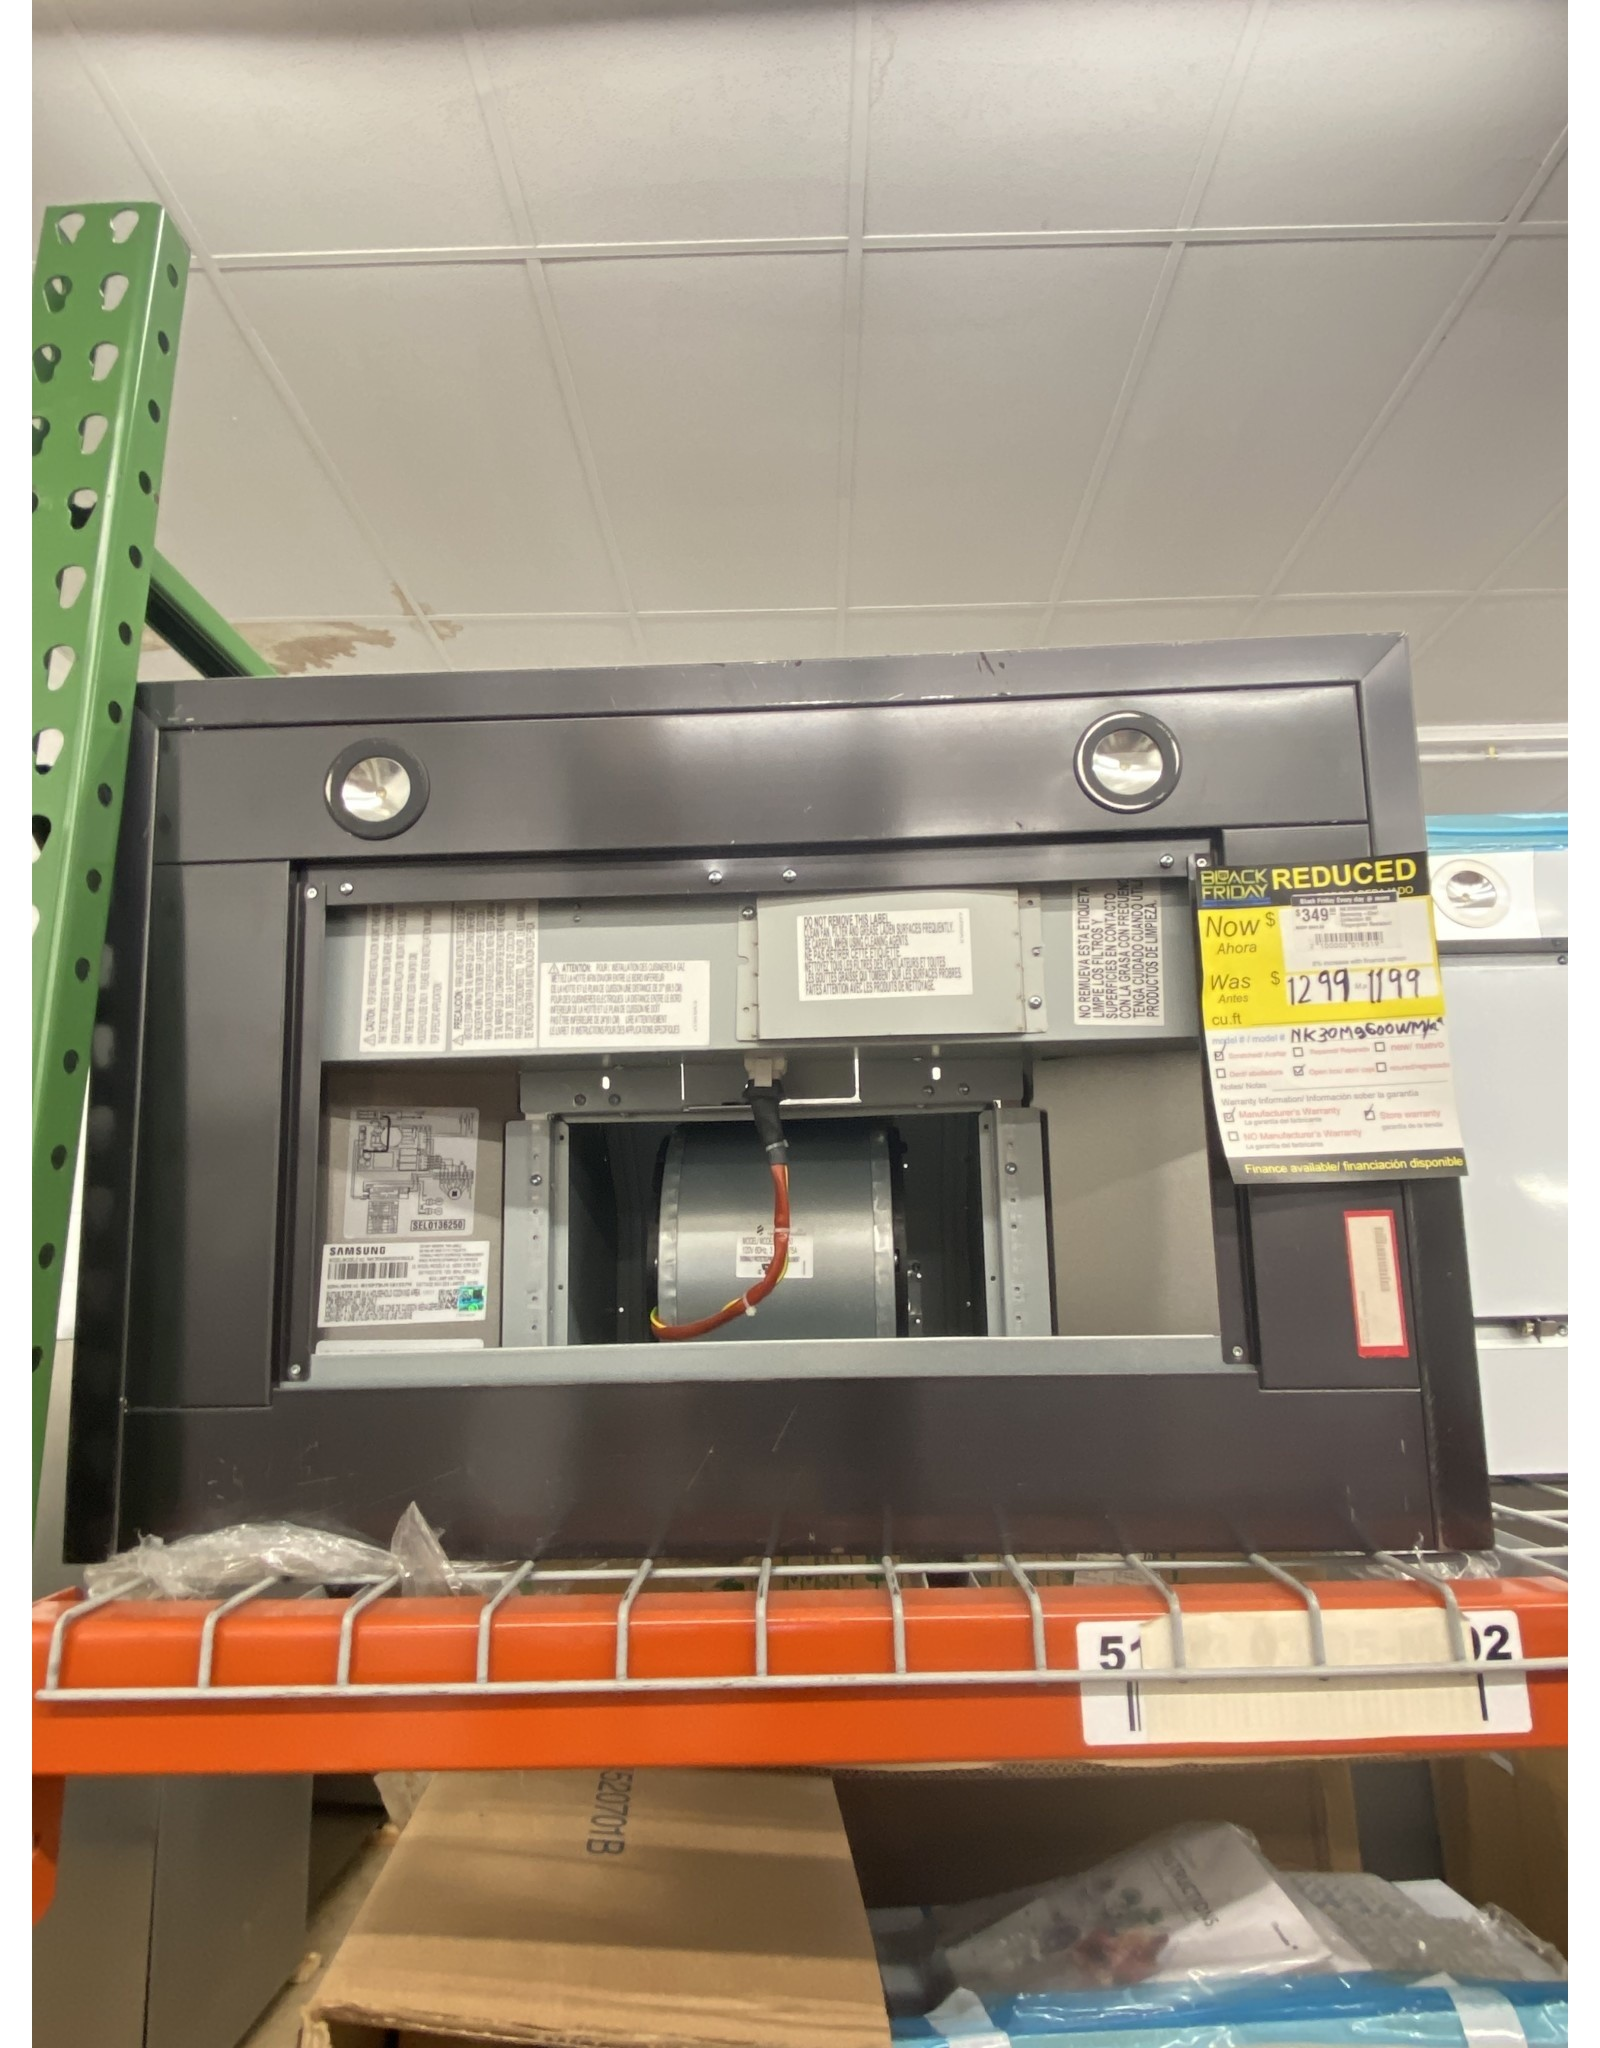 SAMSUNG NK30M9600WM Samsung-Chef Collection 30″ Fingerprint Resistant Range Hood-Matte Black Stainless Steel – Fingerprint Resistant Matte Black Stainless Steel